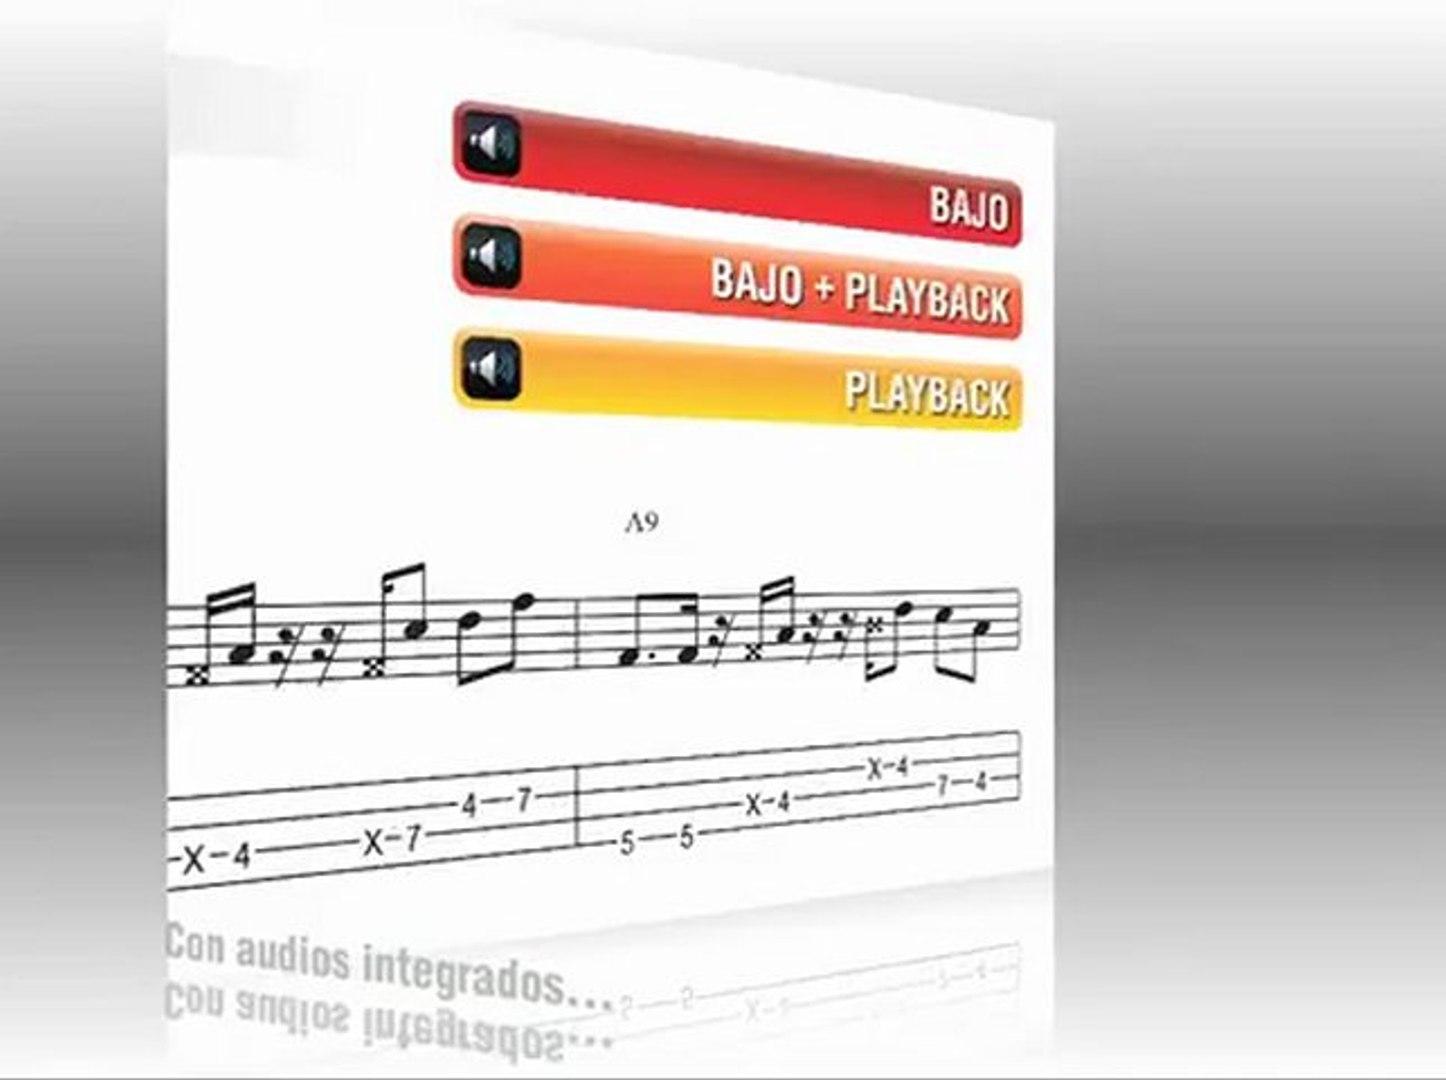 Clase de bajo - Líneas de bajo Rhythm 'n' Blues & Soul